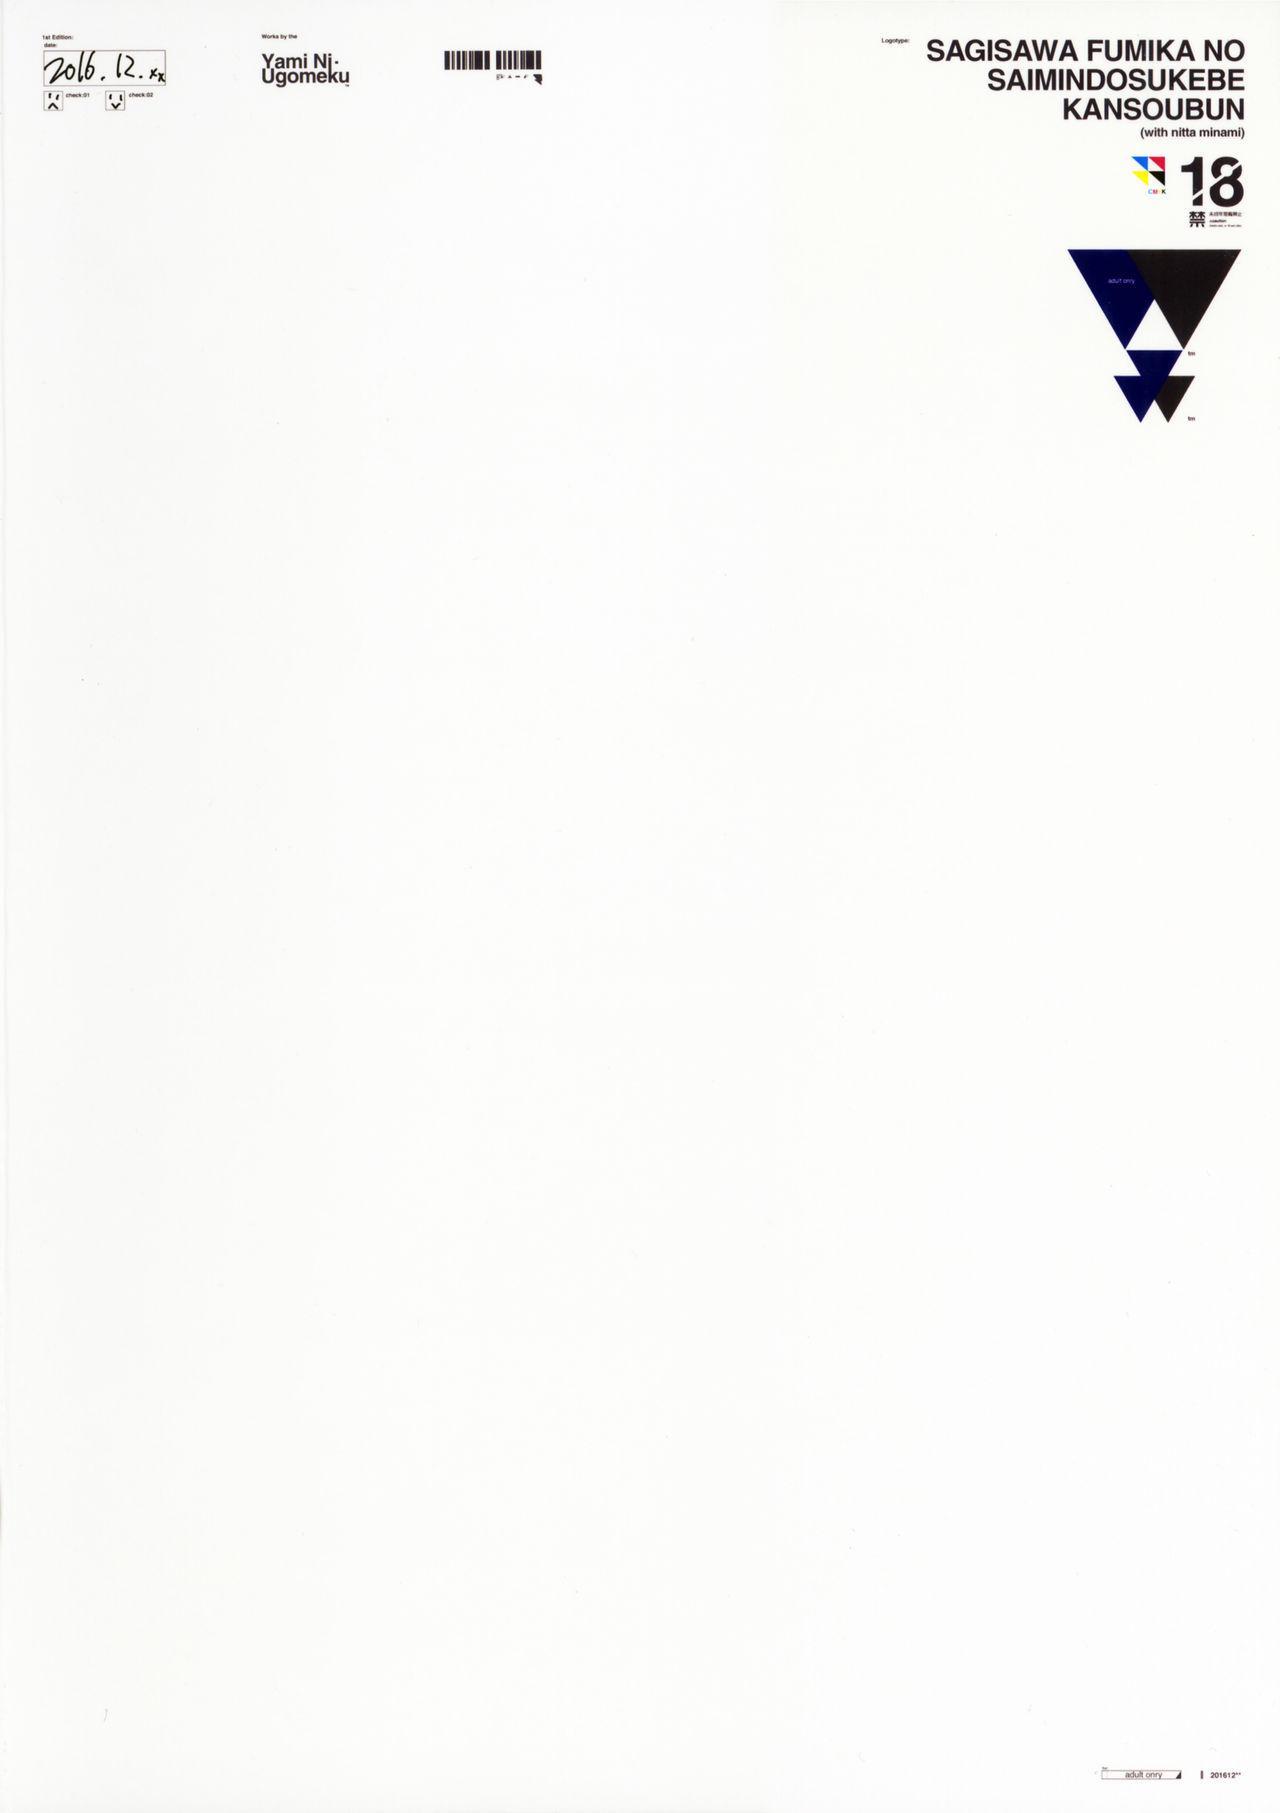 (C91) [Yami ni Ugomeku (Dokurosan)] Sagisawa Fumika no Saimin Dosukebe Kansoubun (with Nitta Minami) + Omake Paper (THE IDOLM@STER CINDERELLA GIRLS) 23